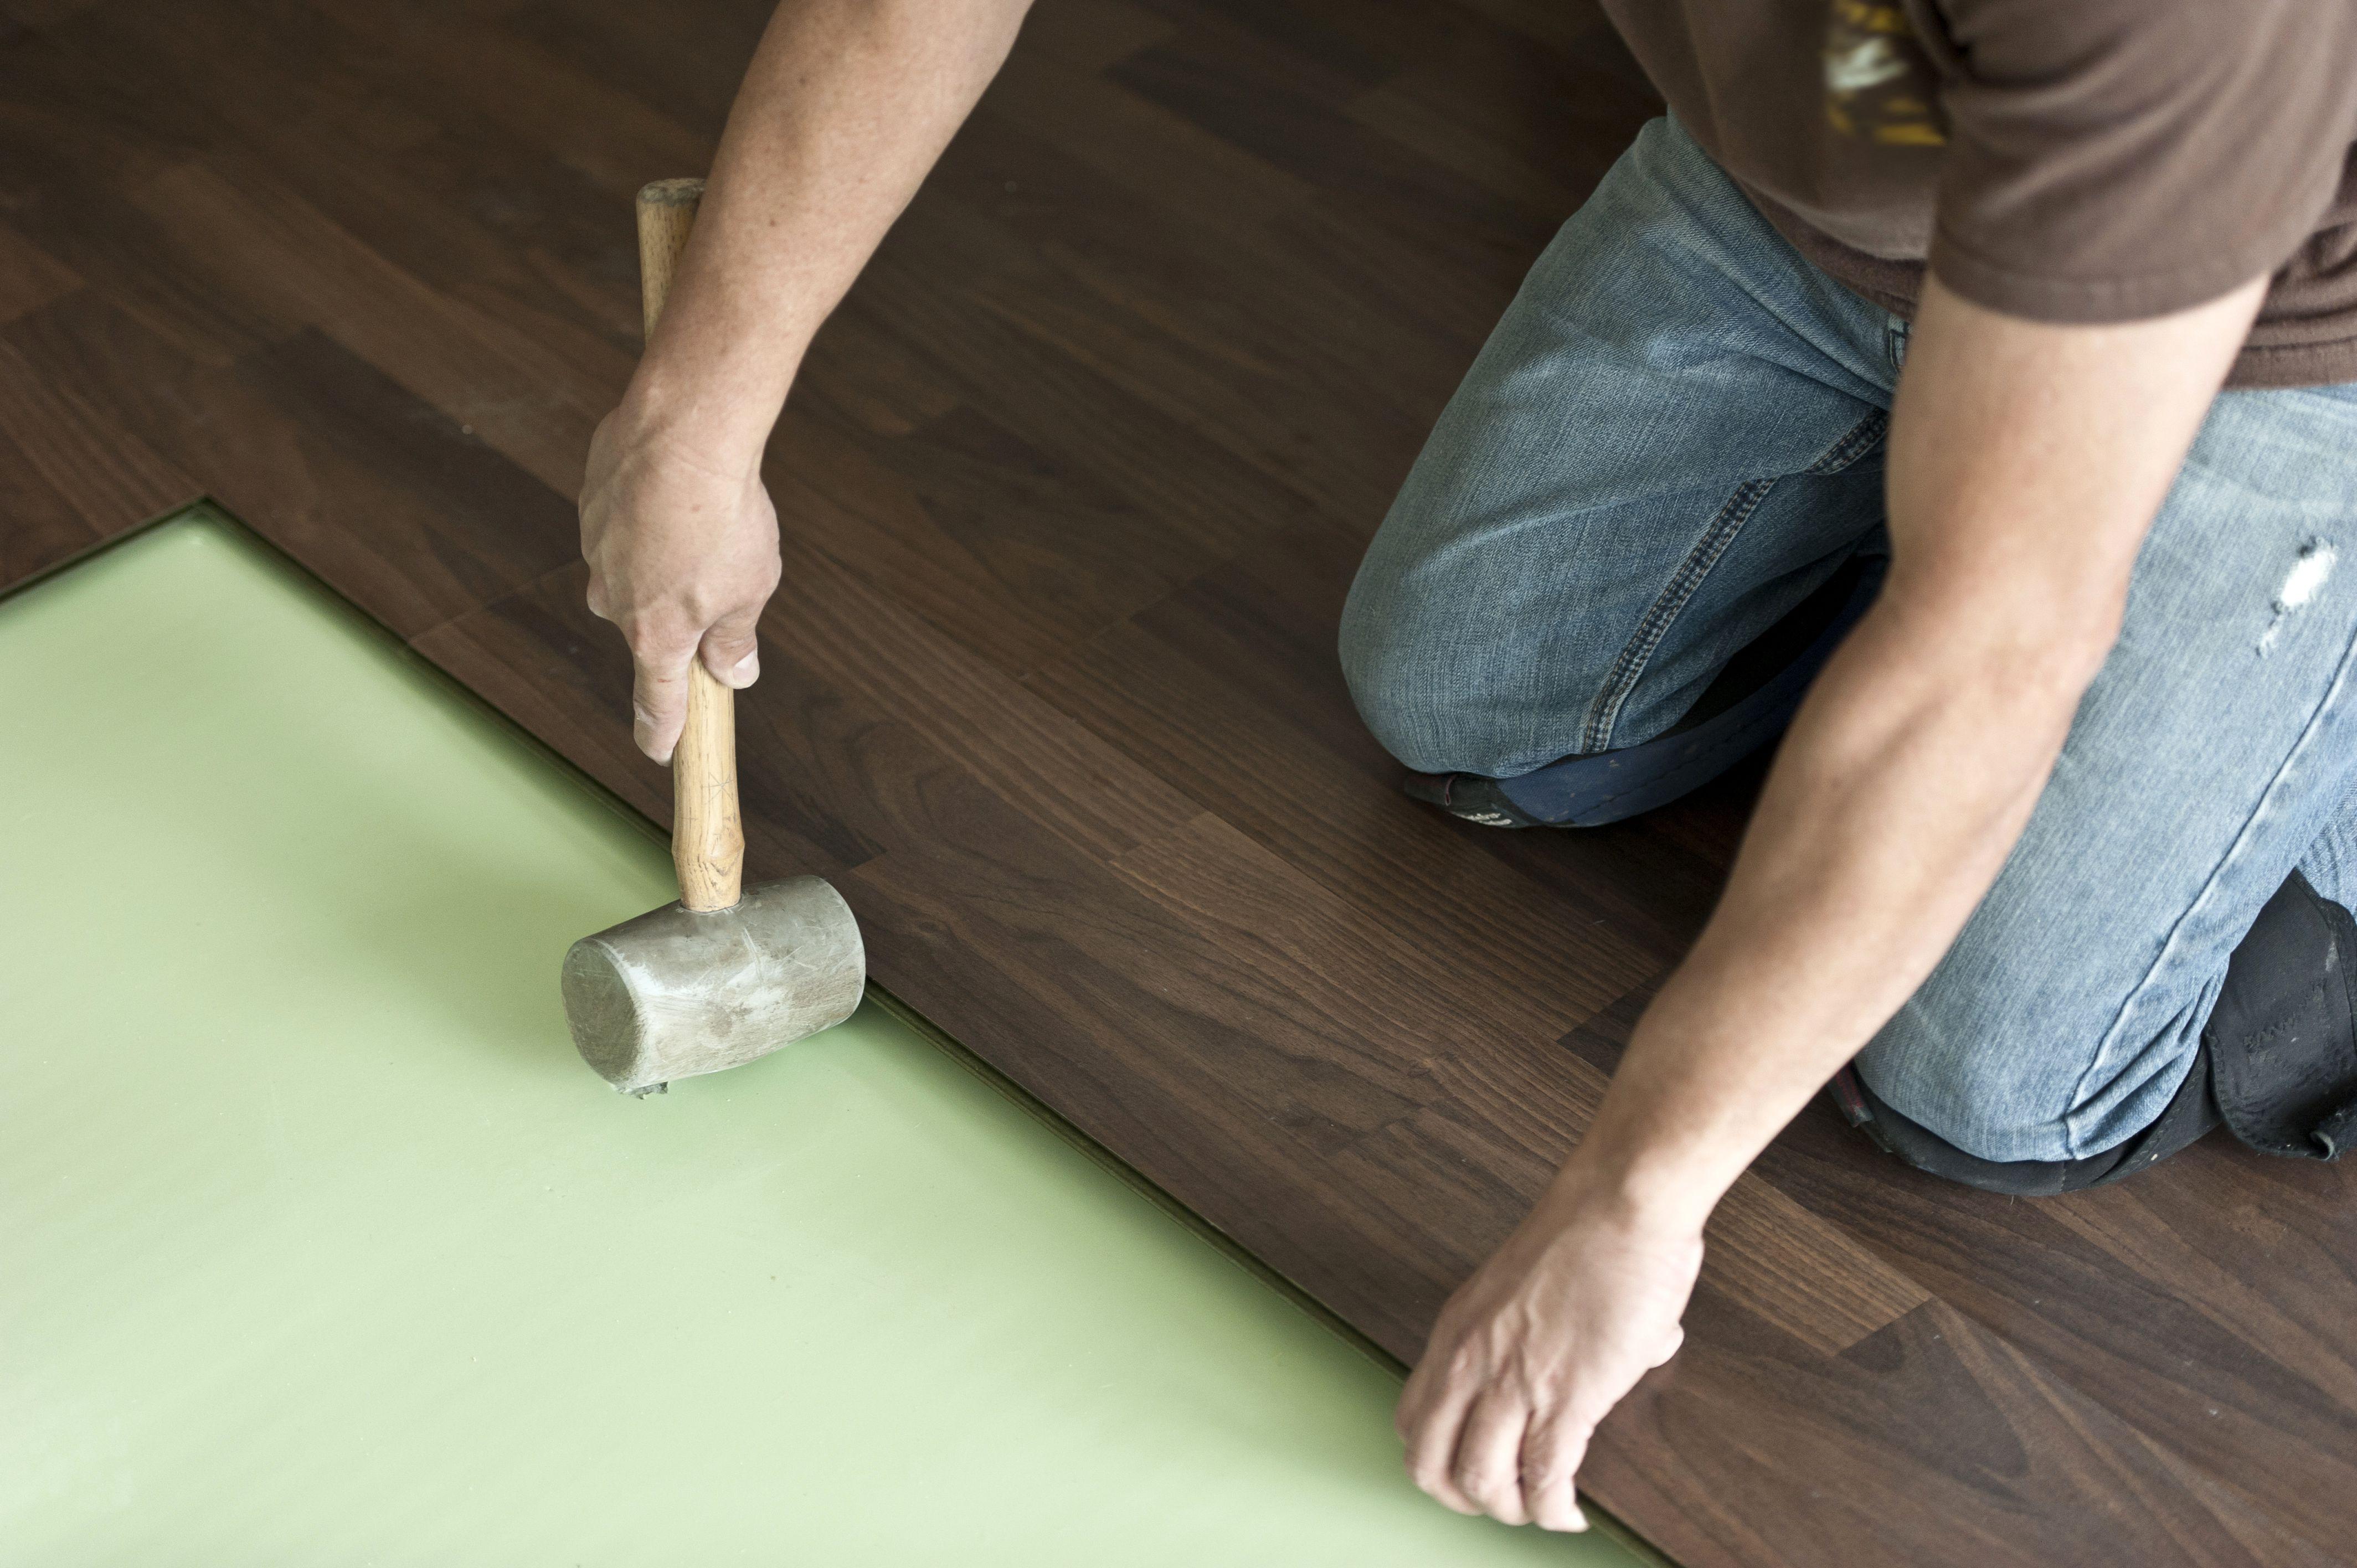 discount hardwood floors and molding of can a foam pad be use under solid hardwood flooring regarding installing hardwood floor 155149312 57e967d45f9b586c35ade84a